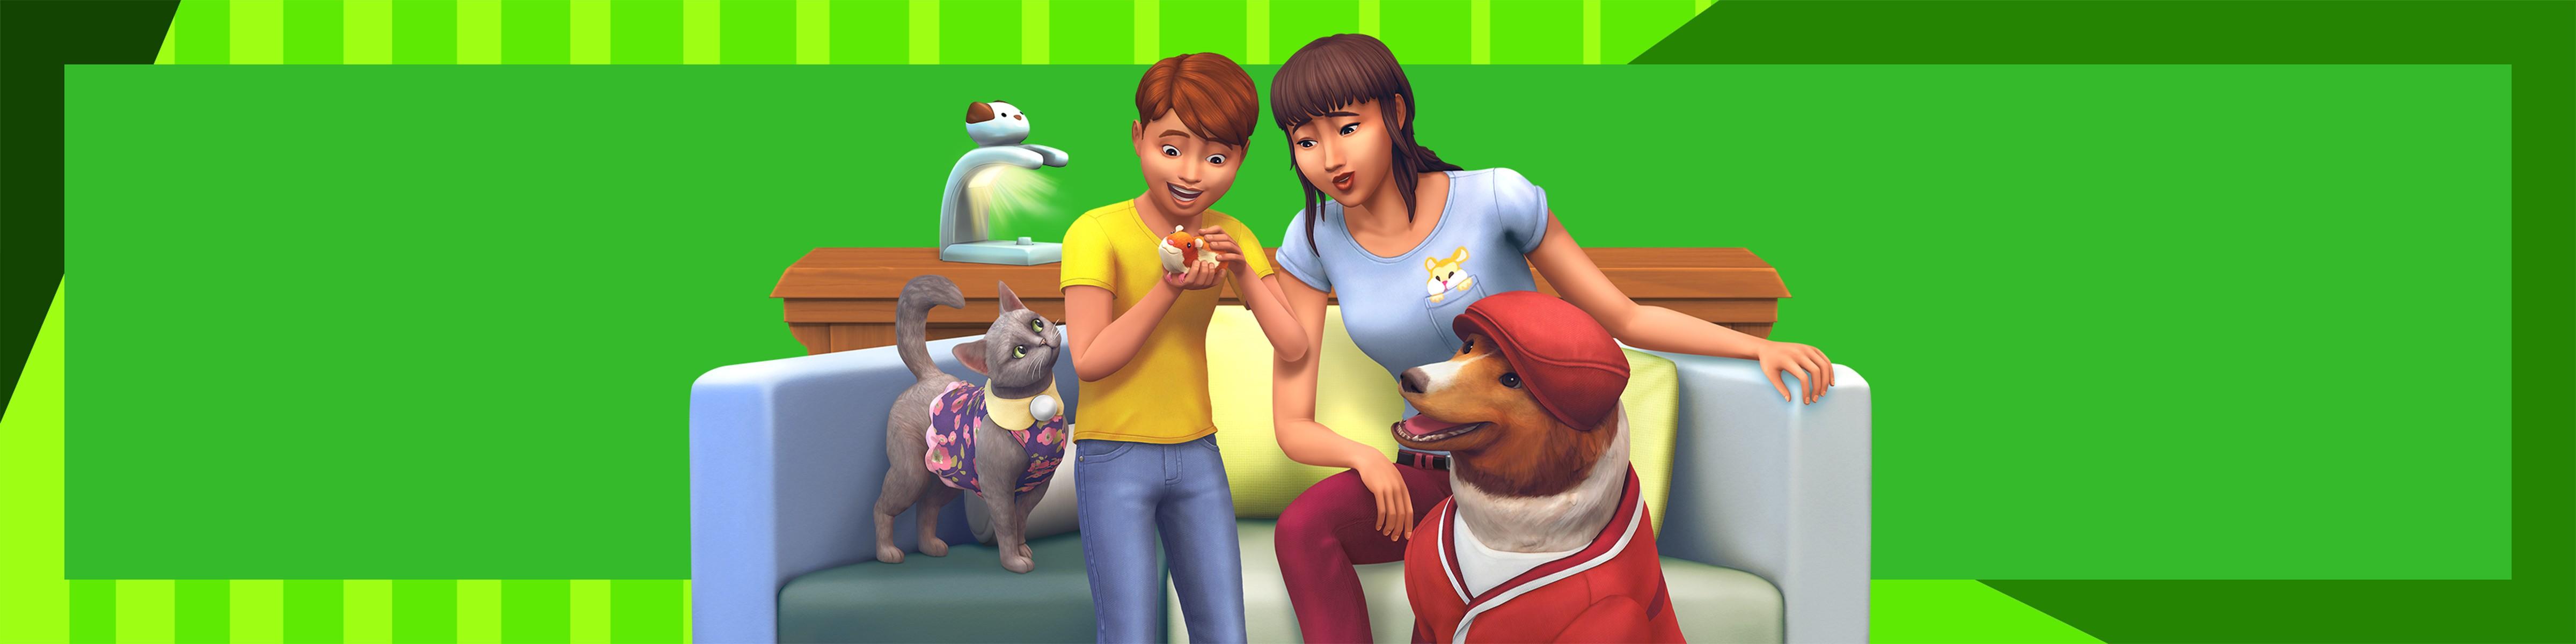 Sims 4 Pets Download Free Mac